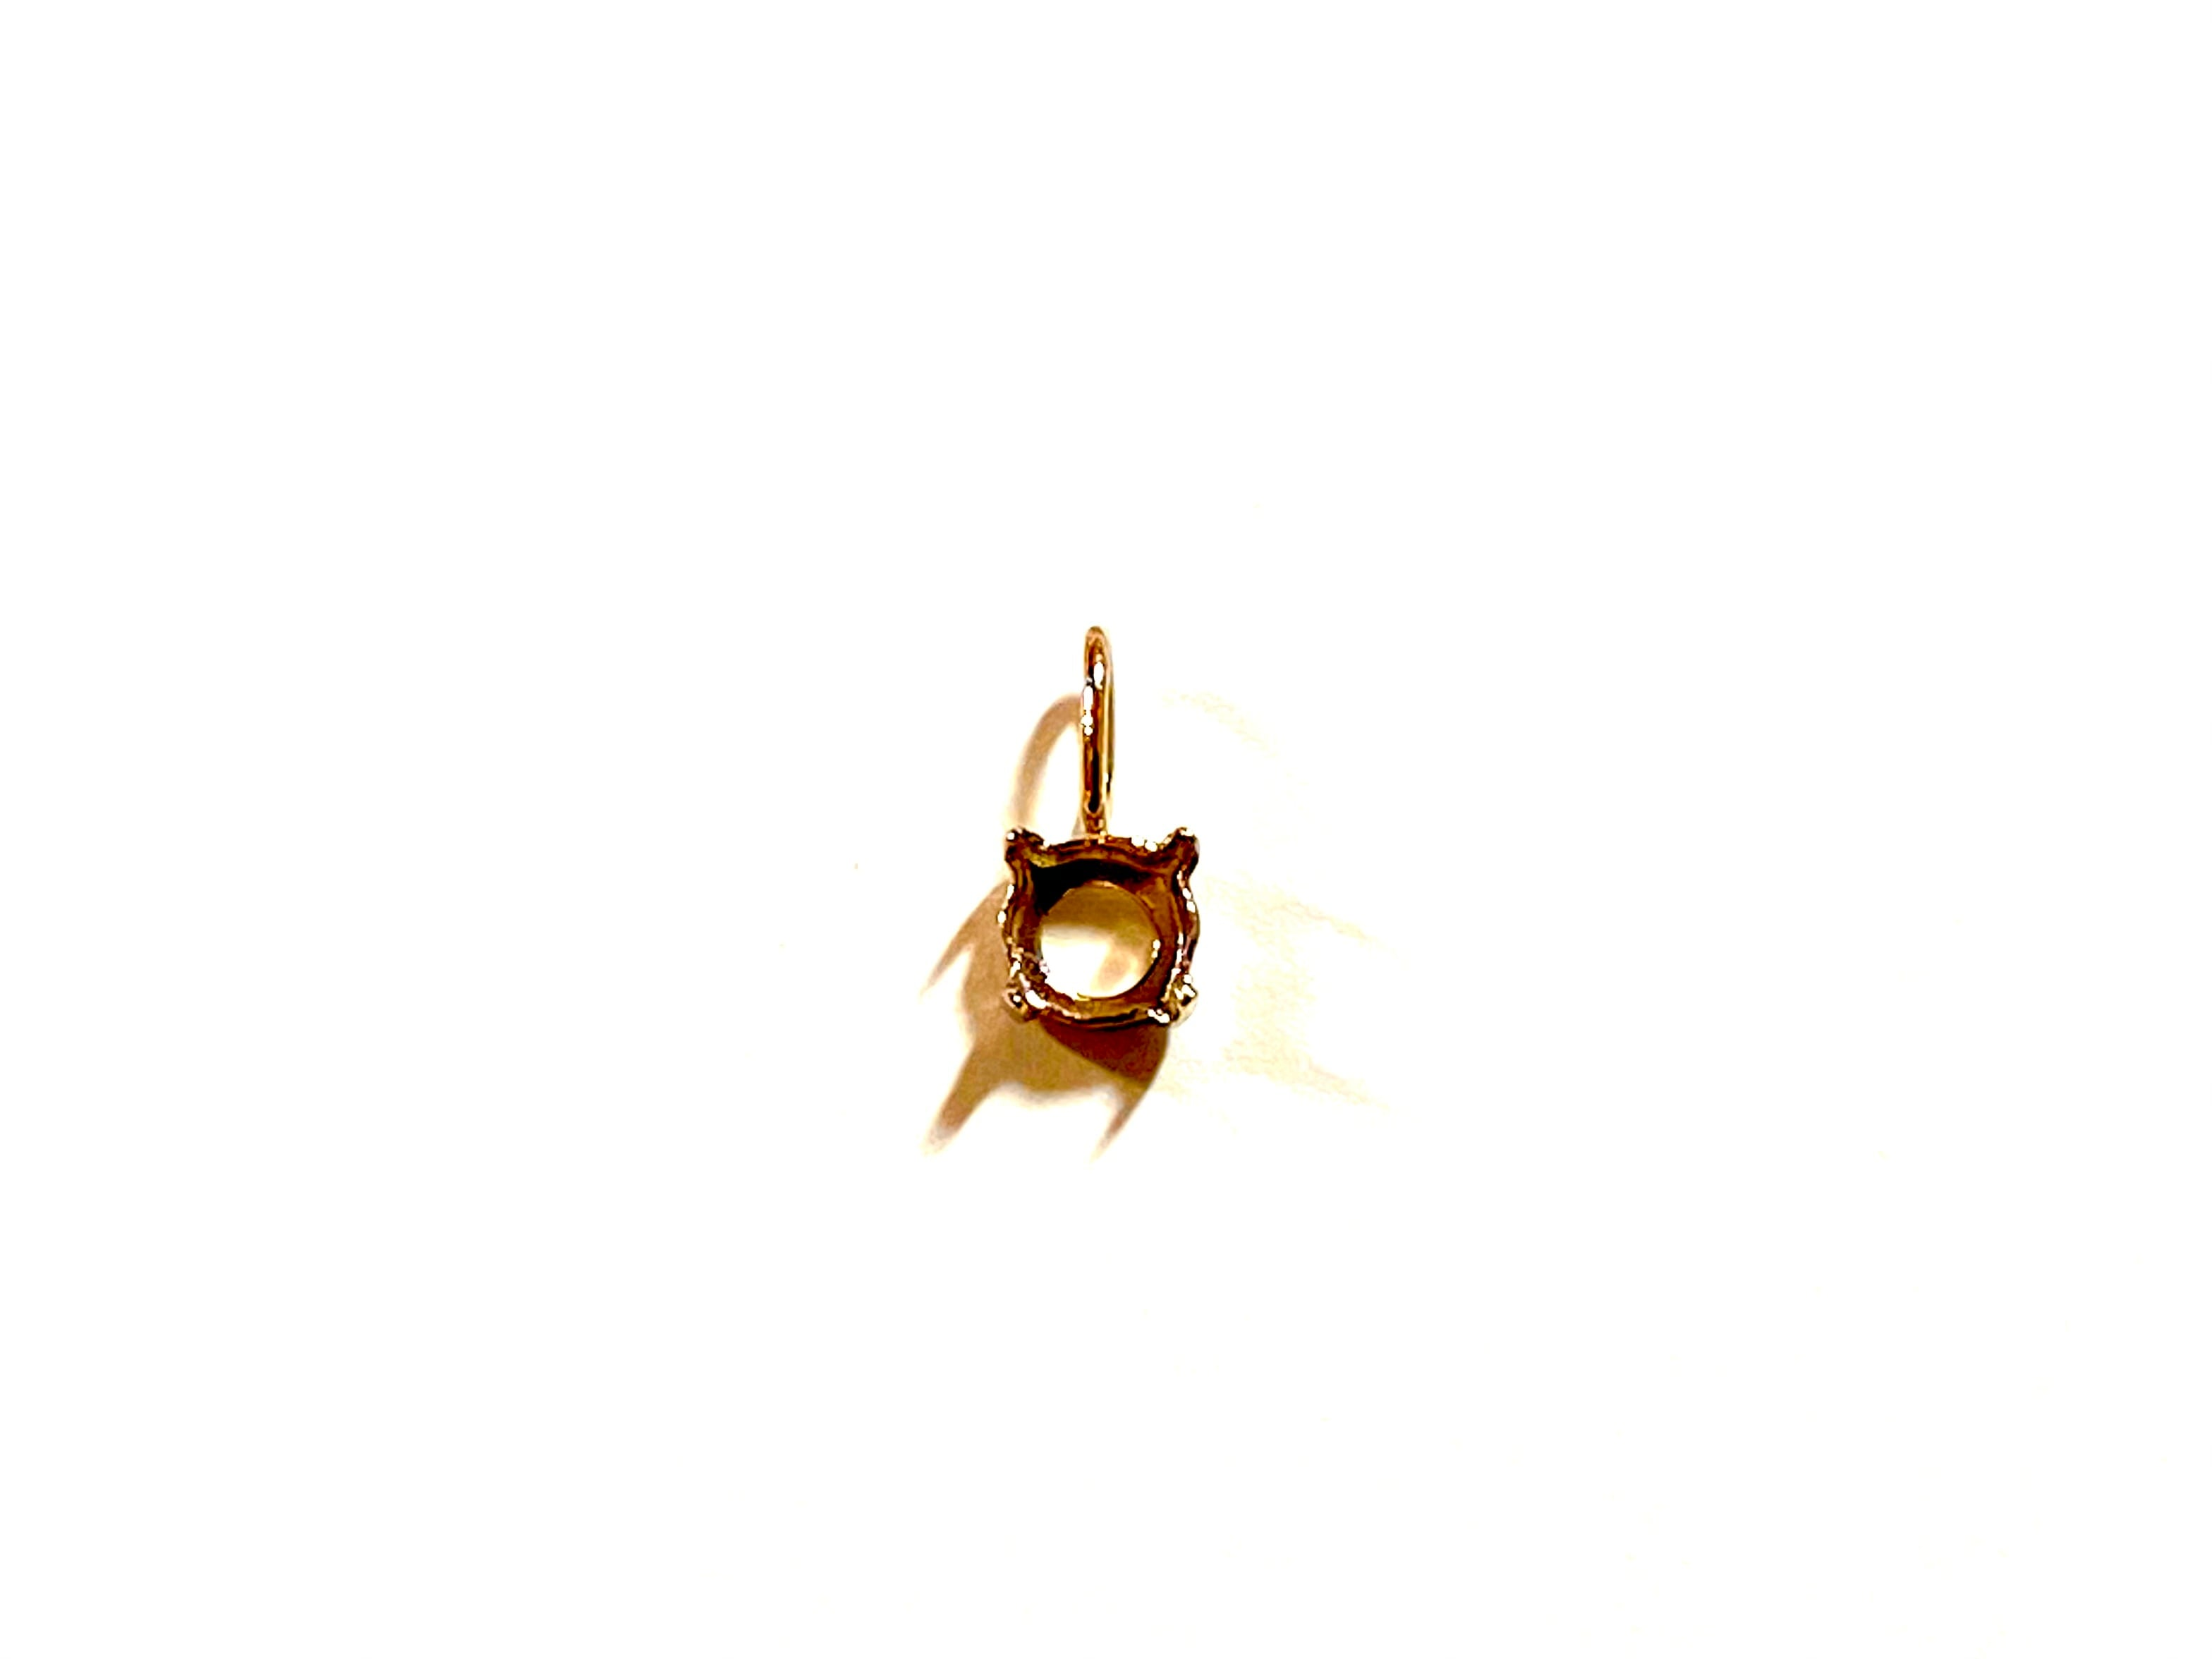 【K10YG】『タテヨコ5mm 』ラウンド対応空枠 [空枠No,14]